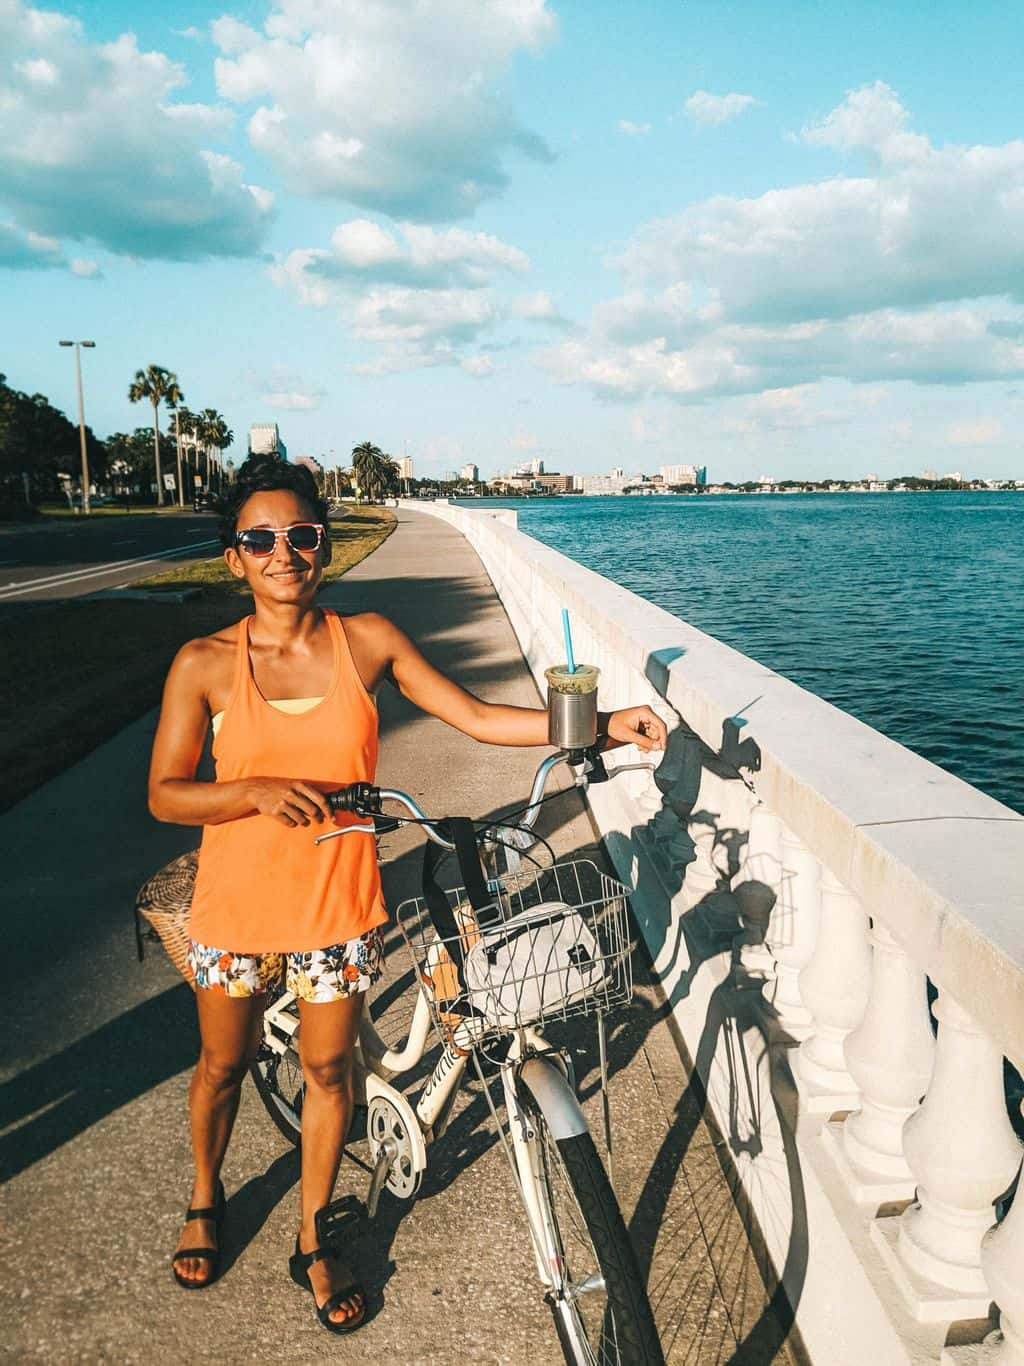 Bayshore Blvd Tampa Bay